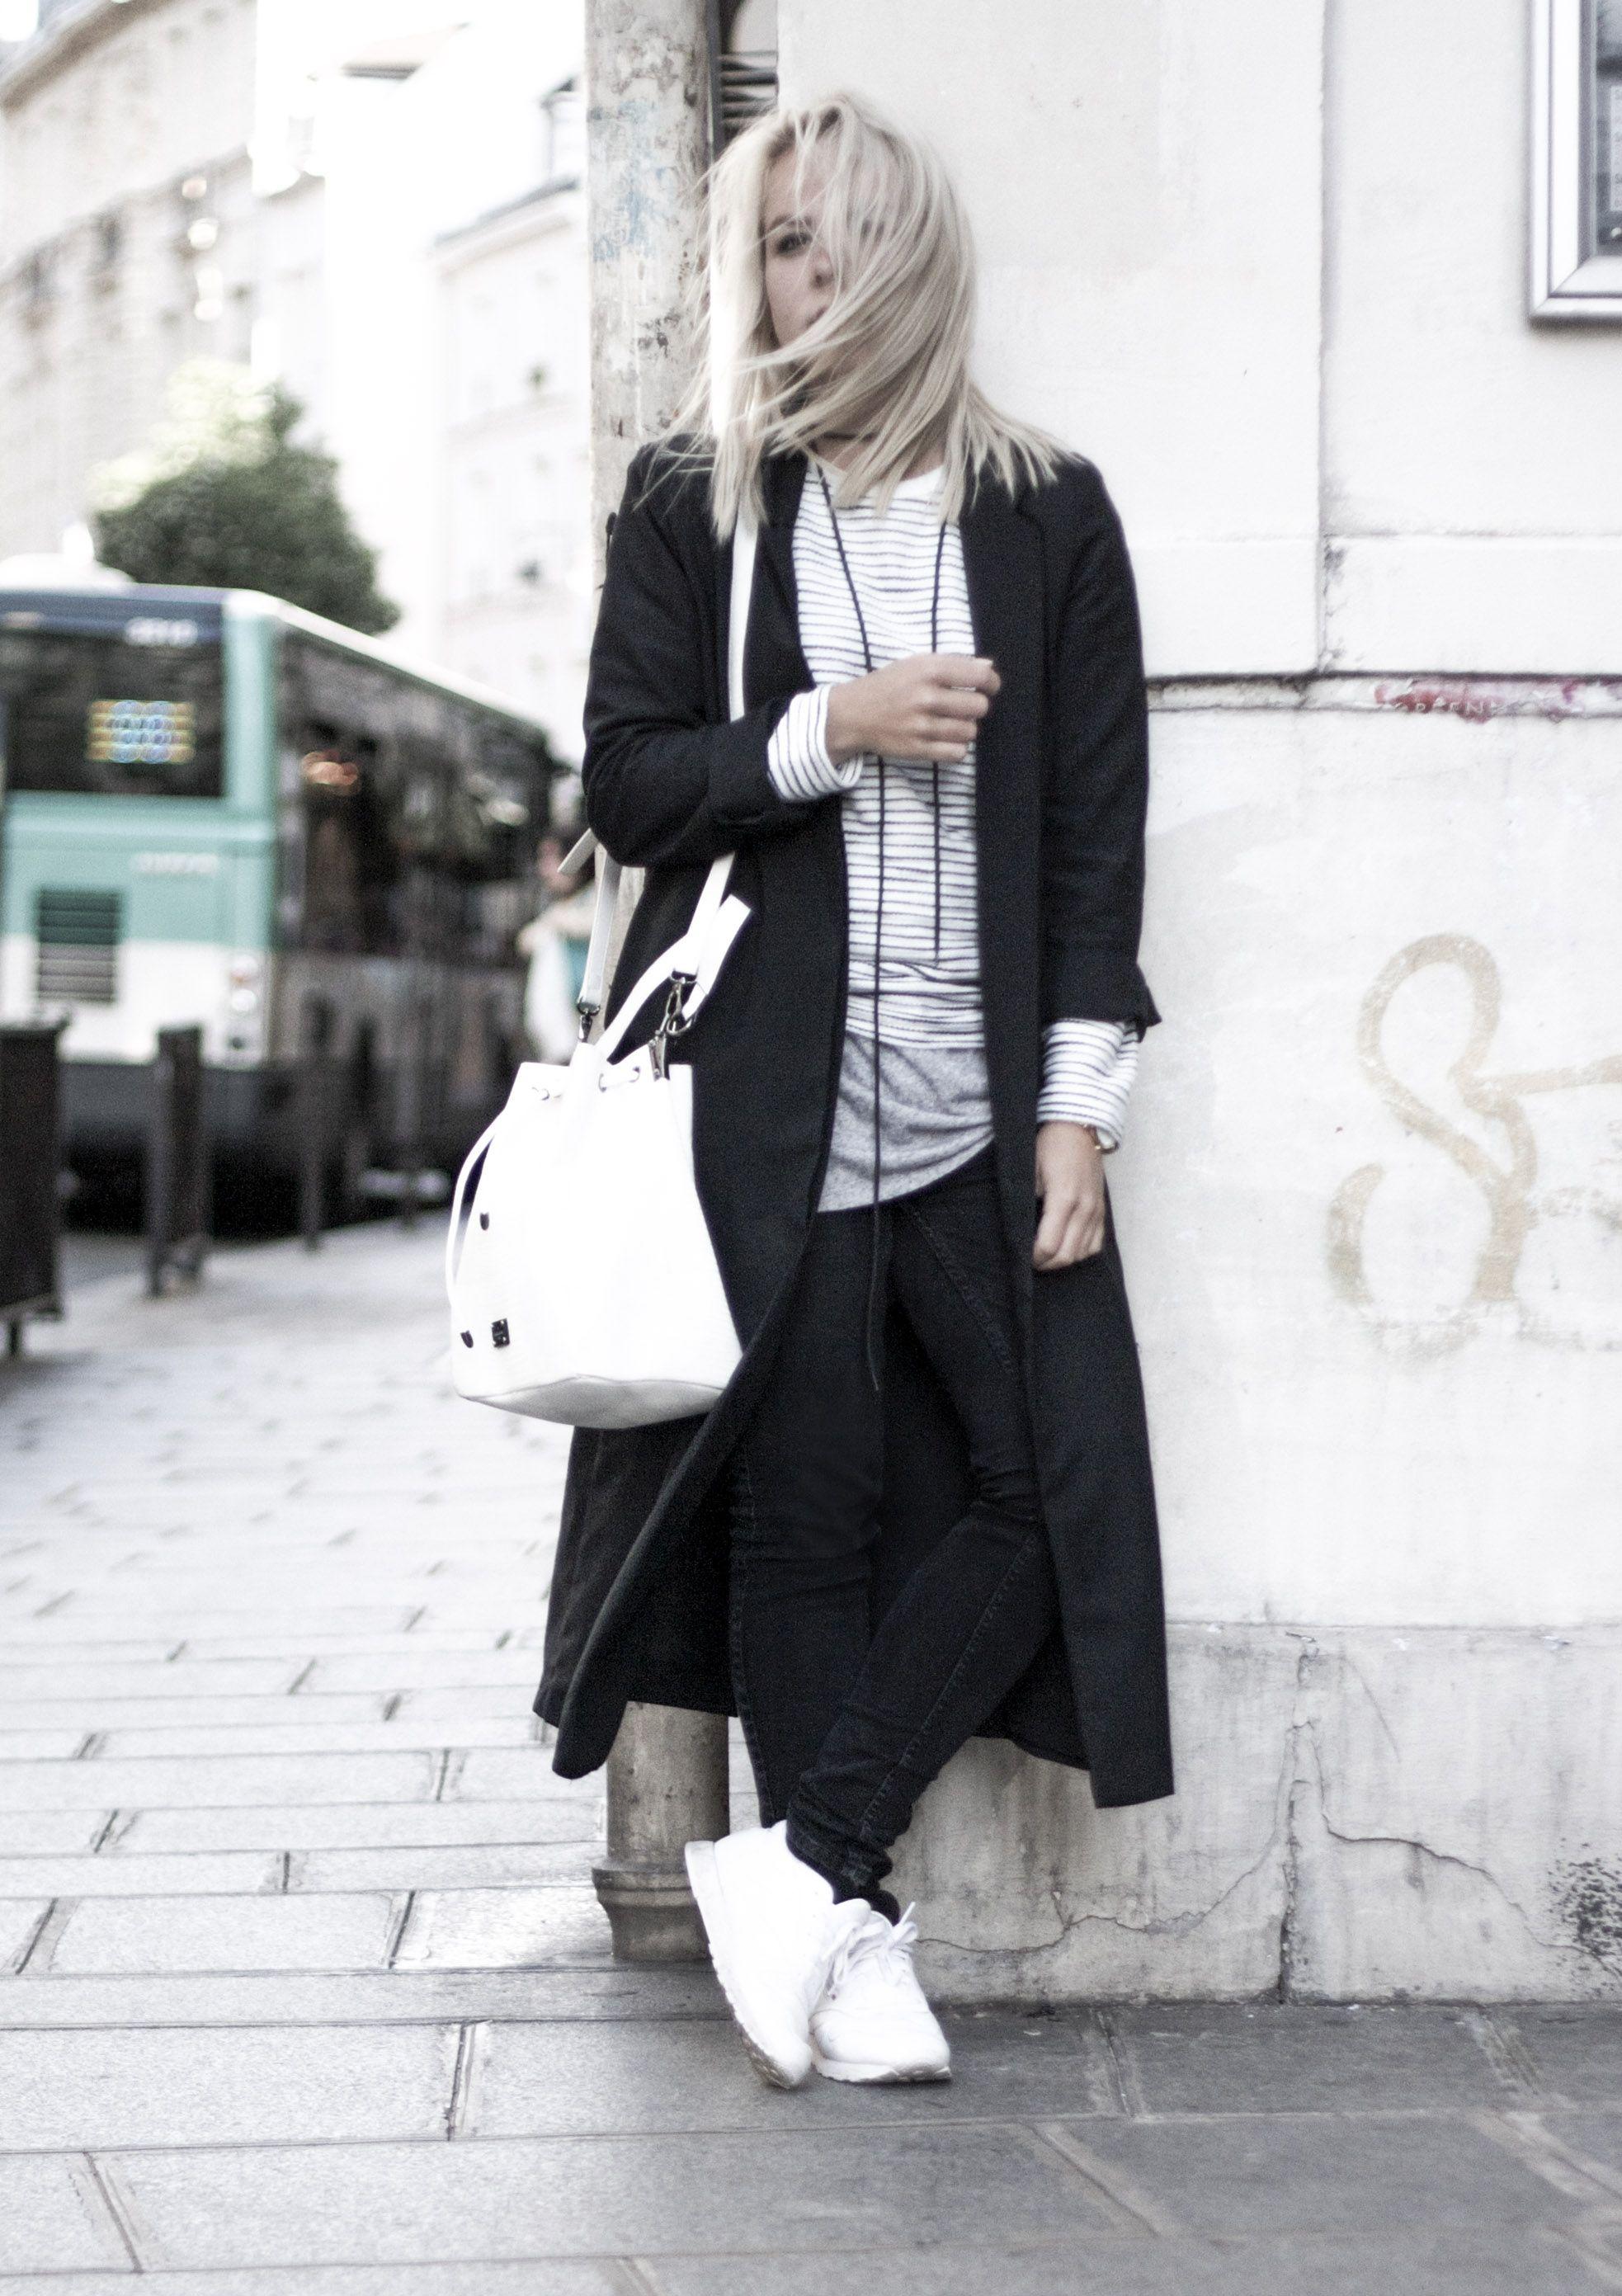 9e49bf4eb7a423 white bucket bag striped sweater reebok sneakers paris le marais  streetstyle Minimal Classic